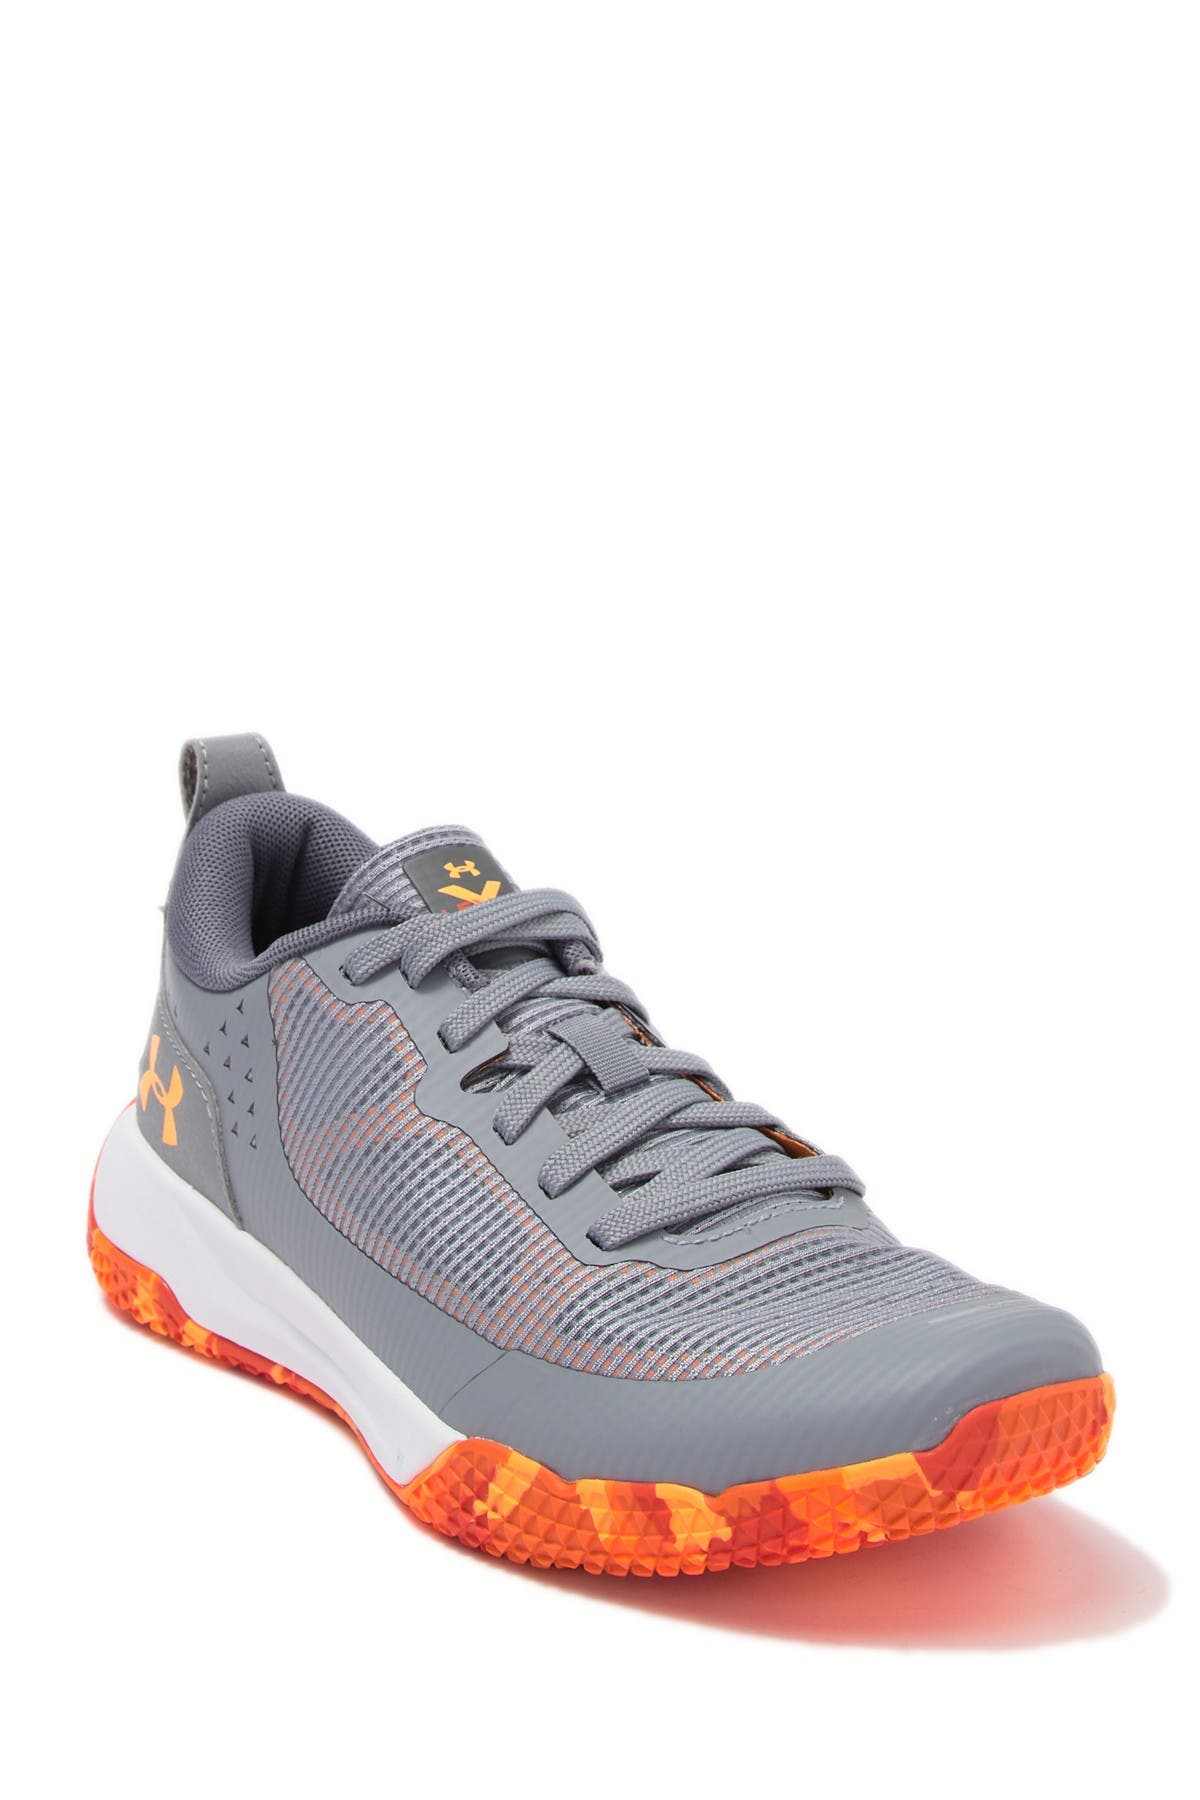 Grade School x Level Mainshock Sneaker